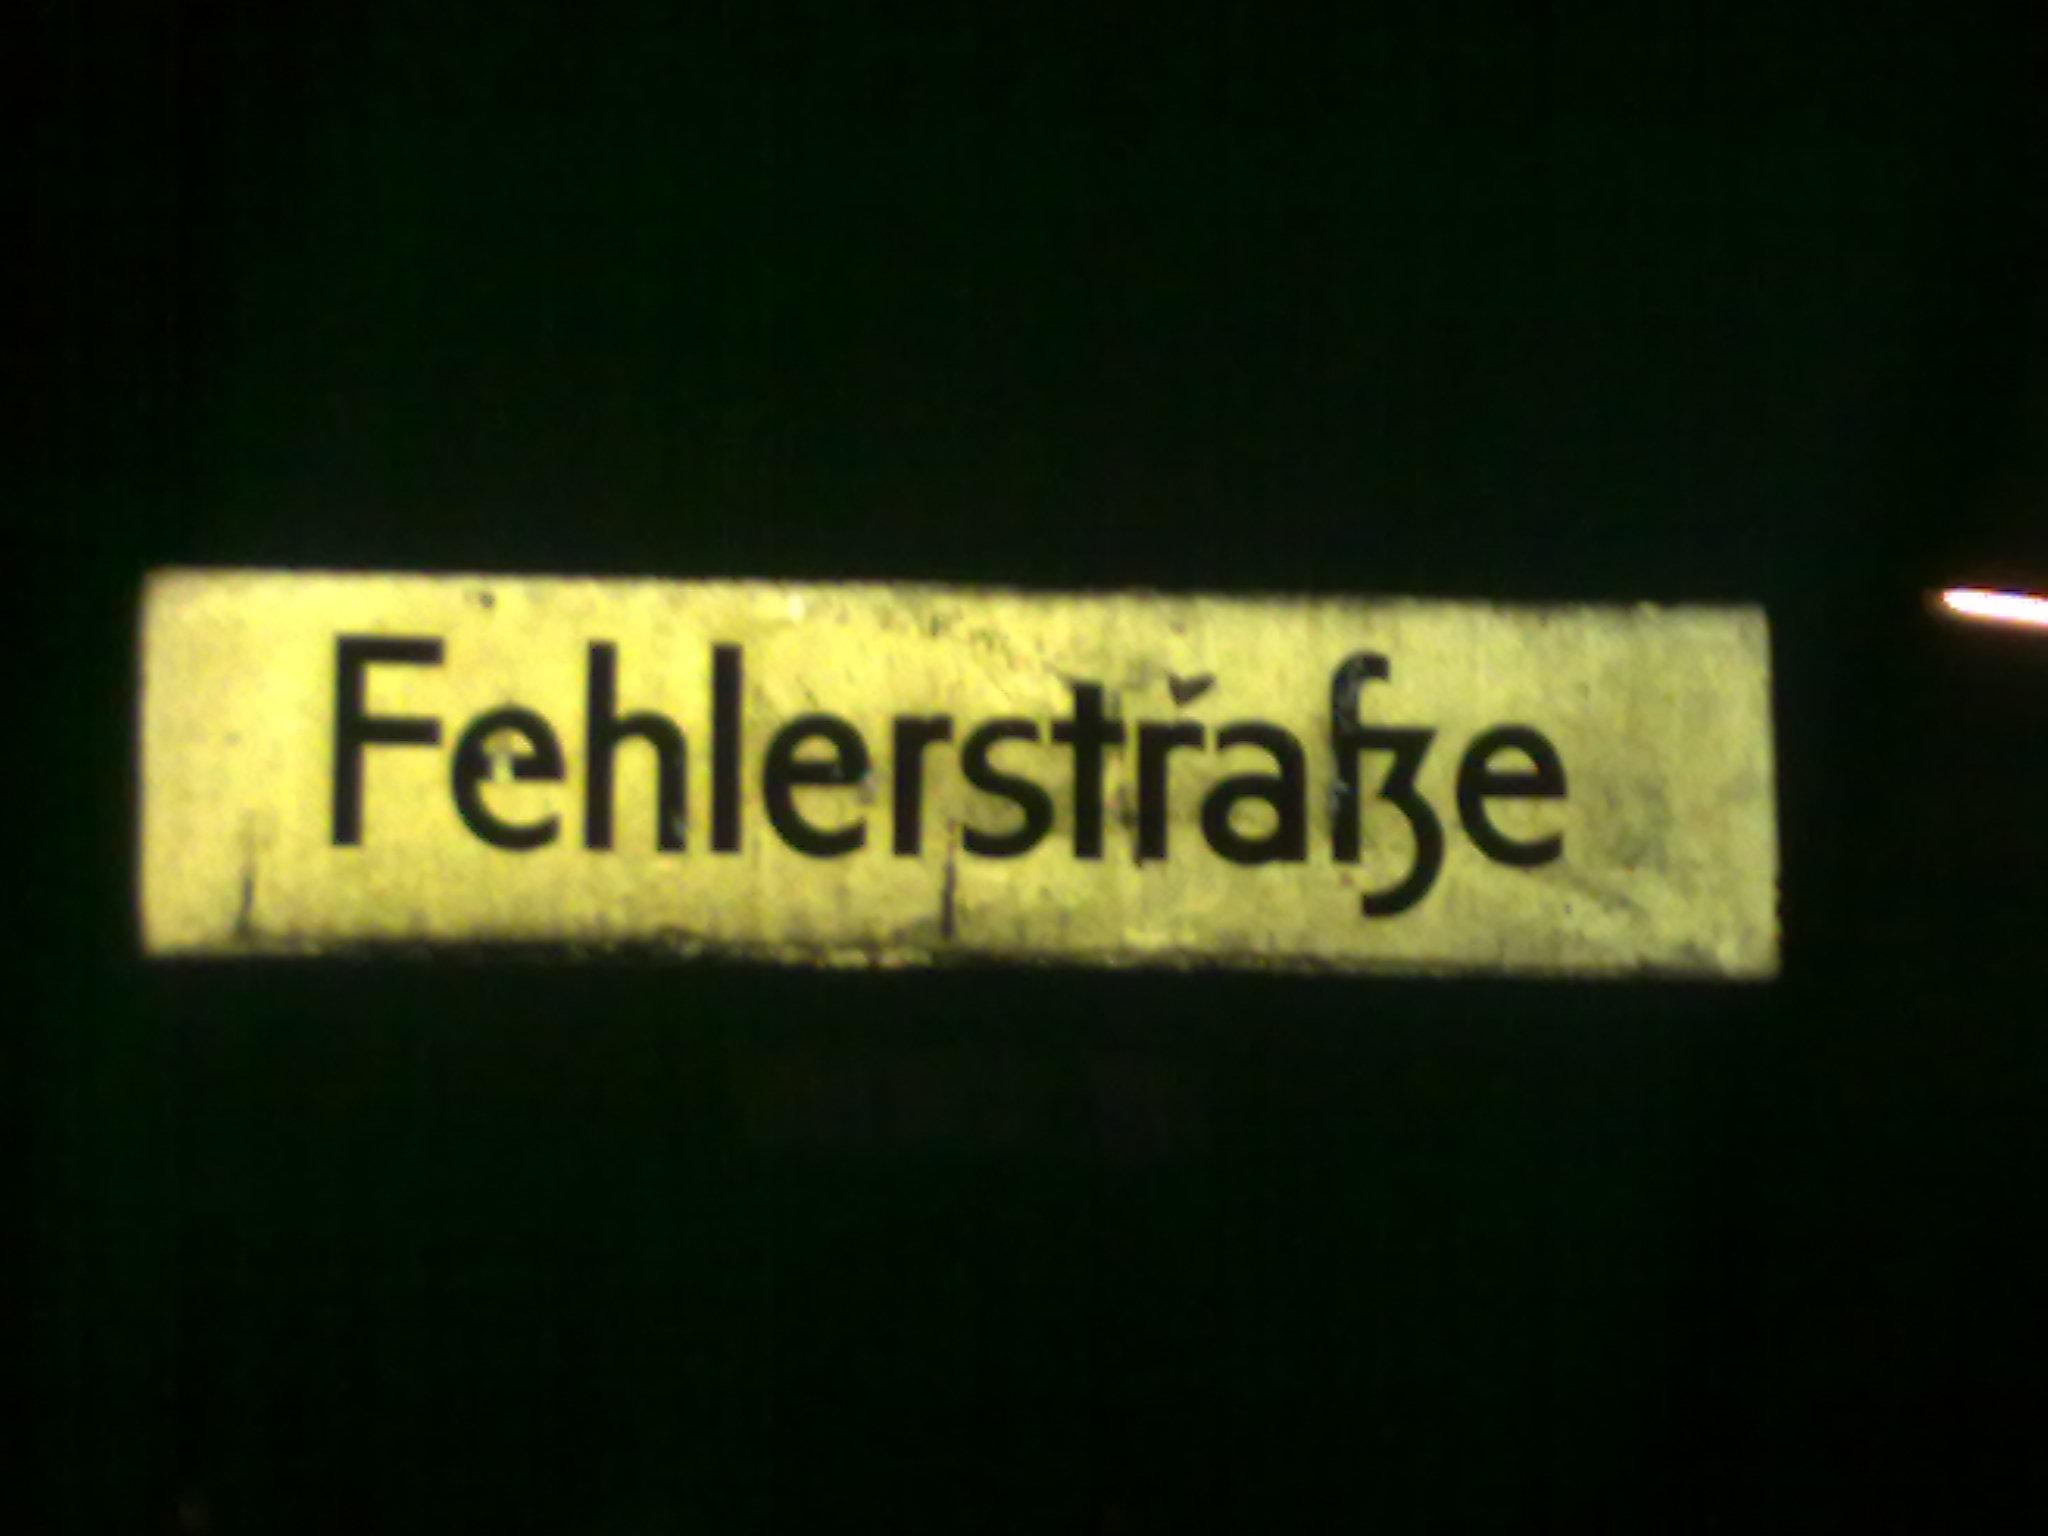 Fehlerstraße Nähe Bundesplatz in Berlin Charlottenburg - Wilmersdorf